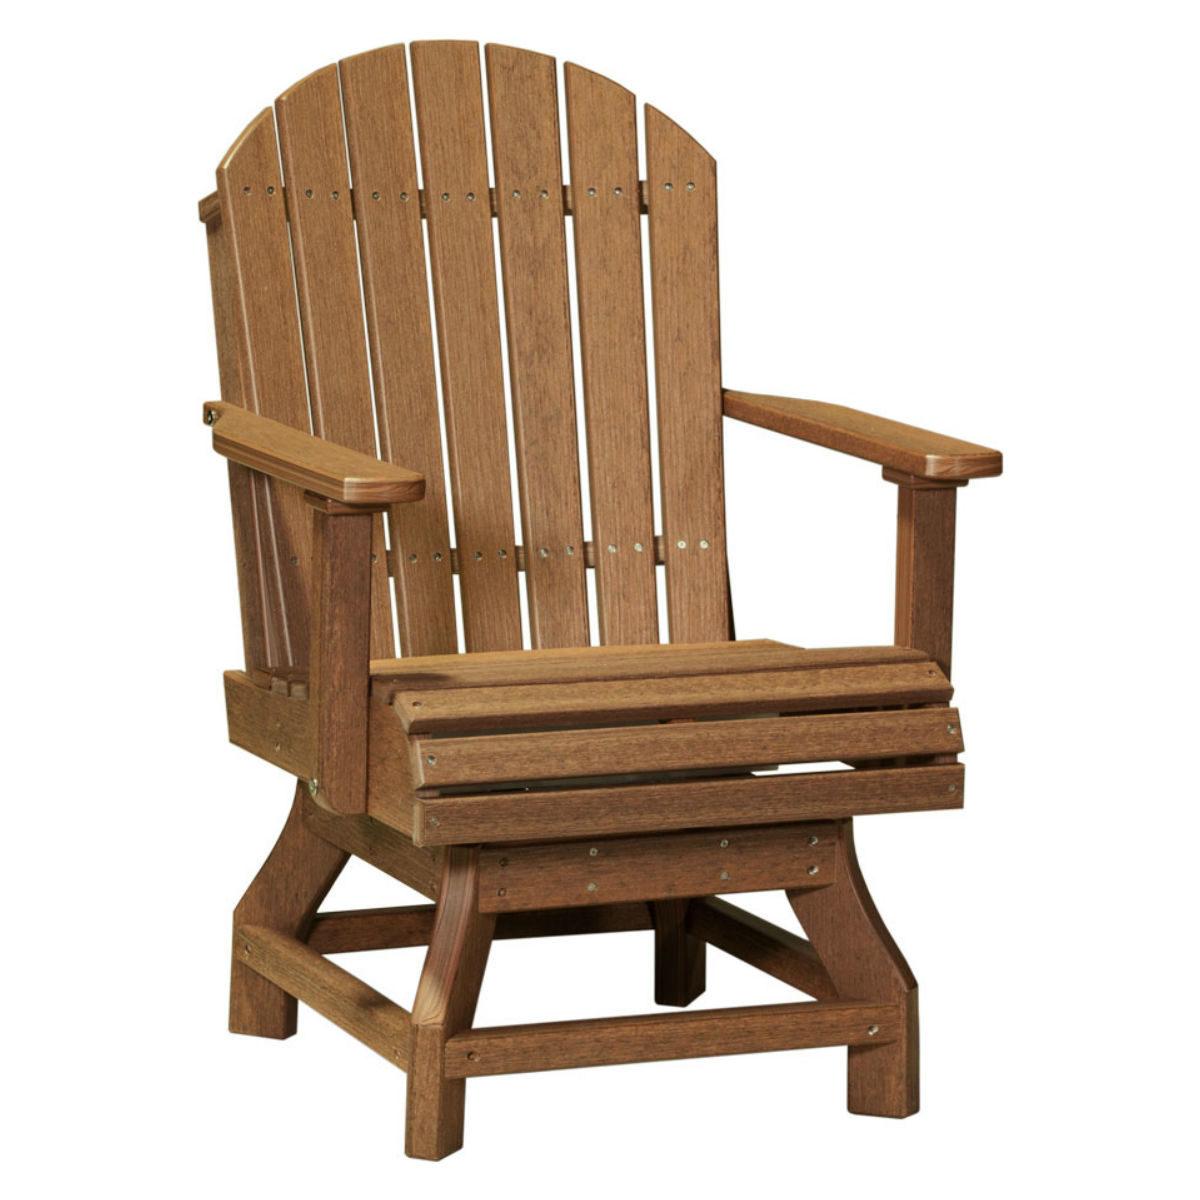 Adirondack Swivel Dining Chair - Antique Mahogany